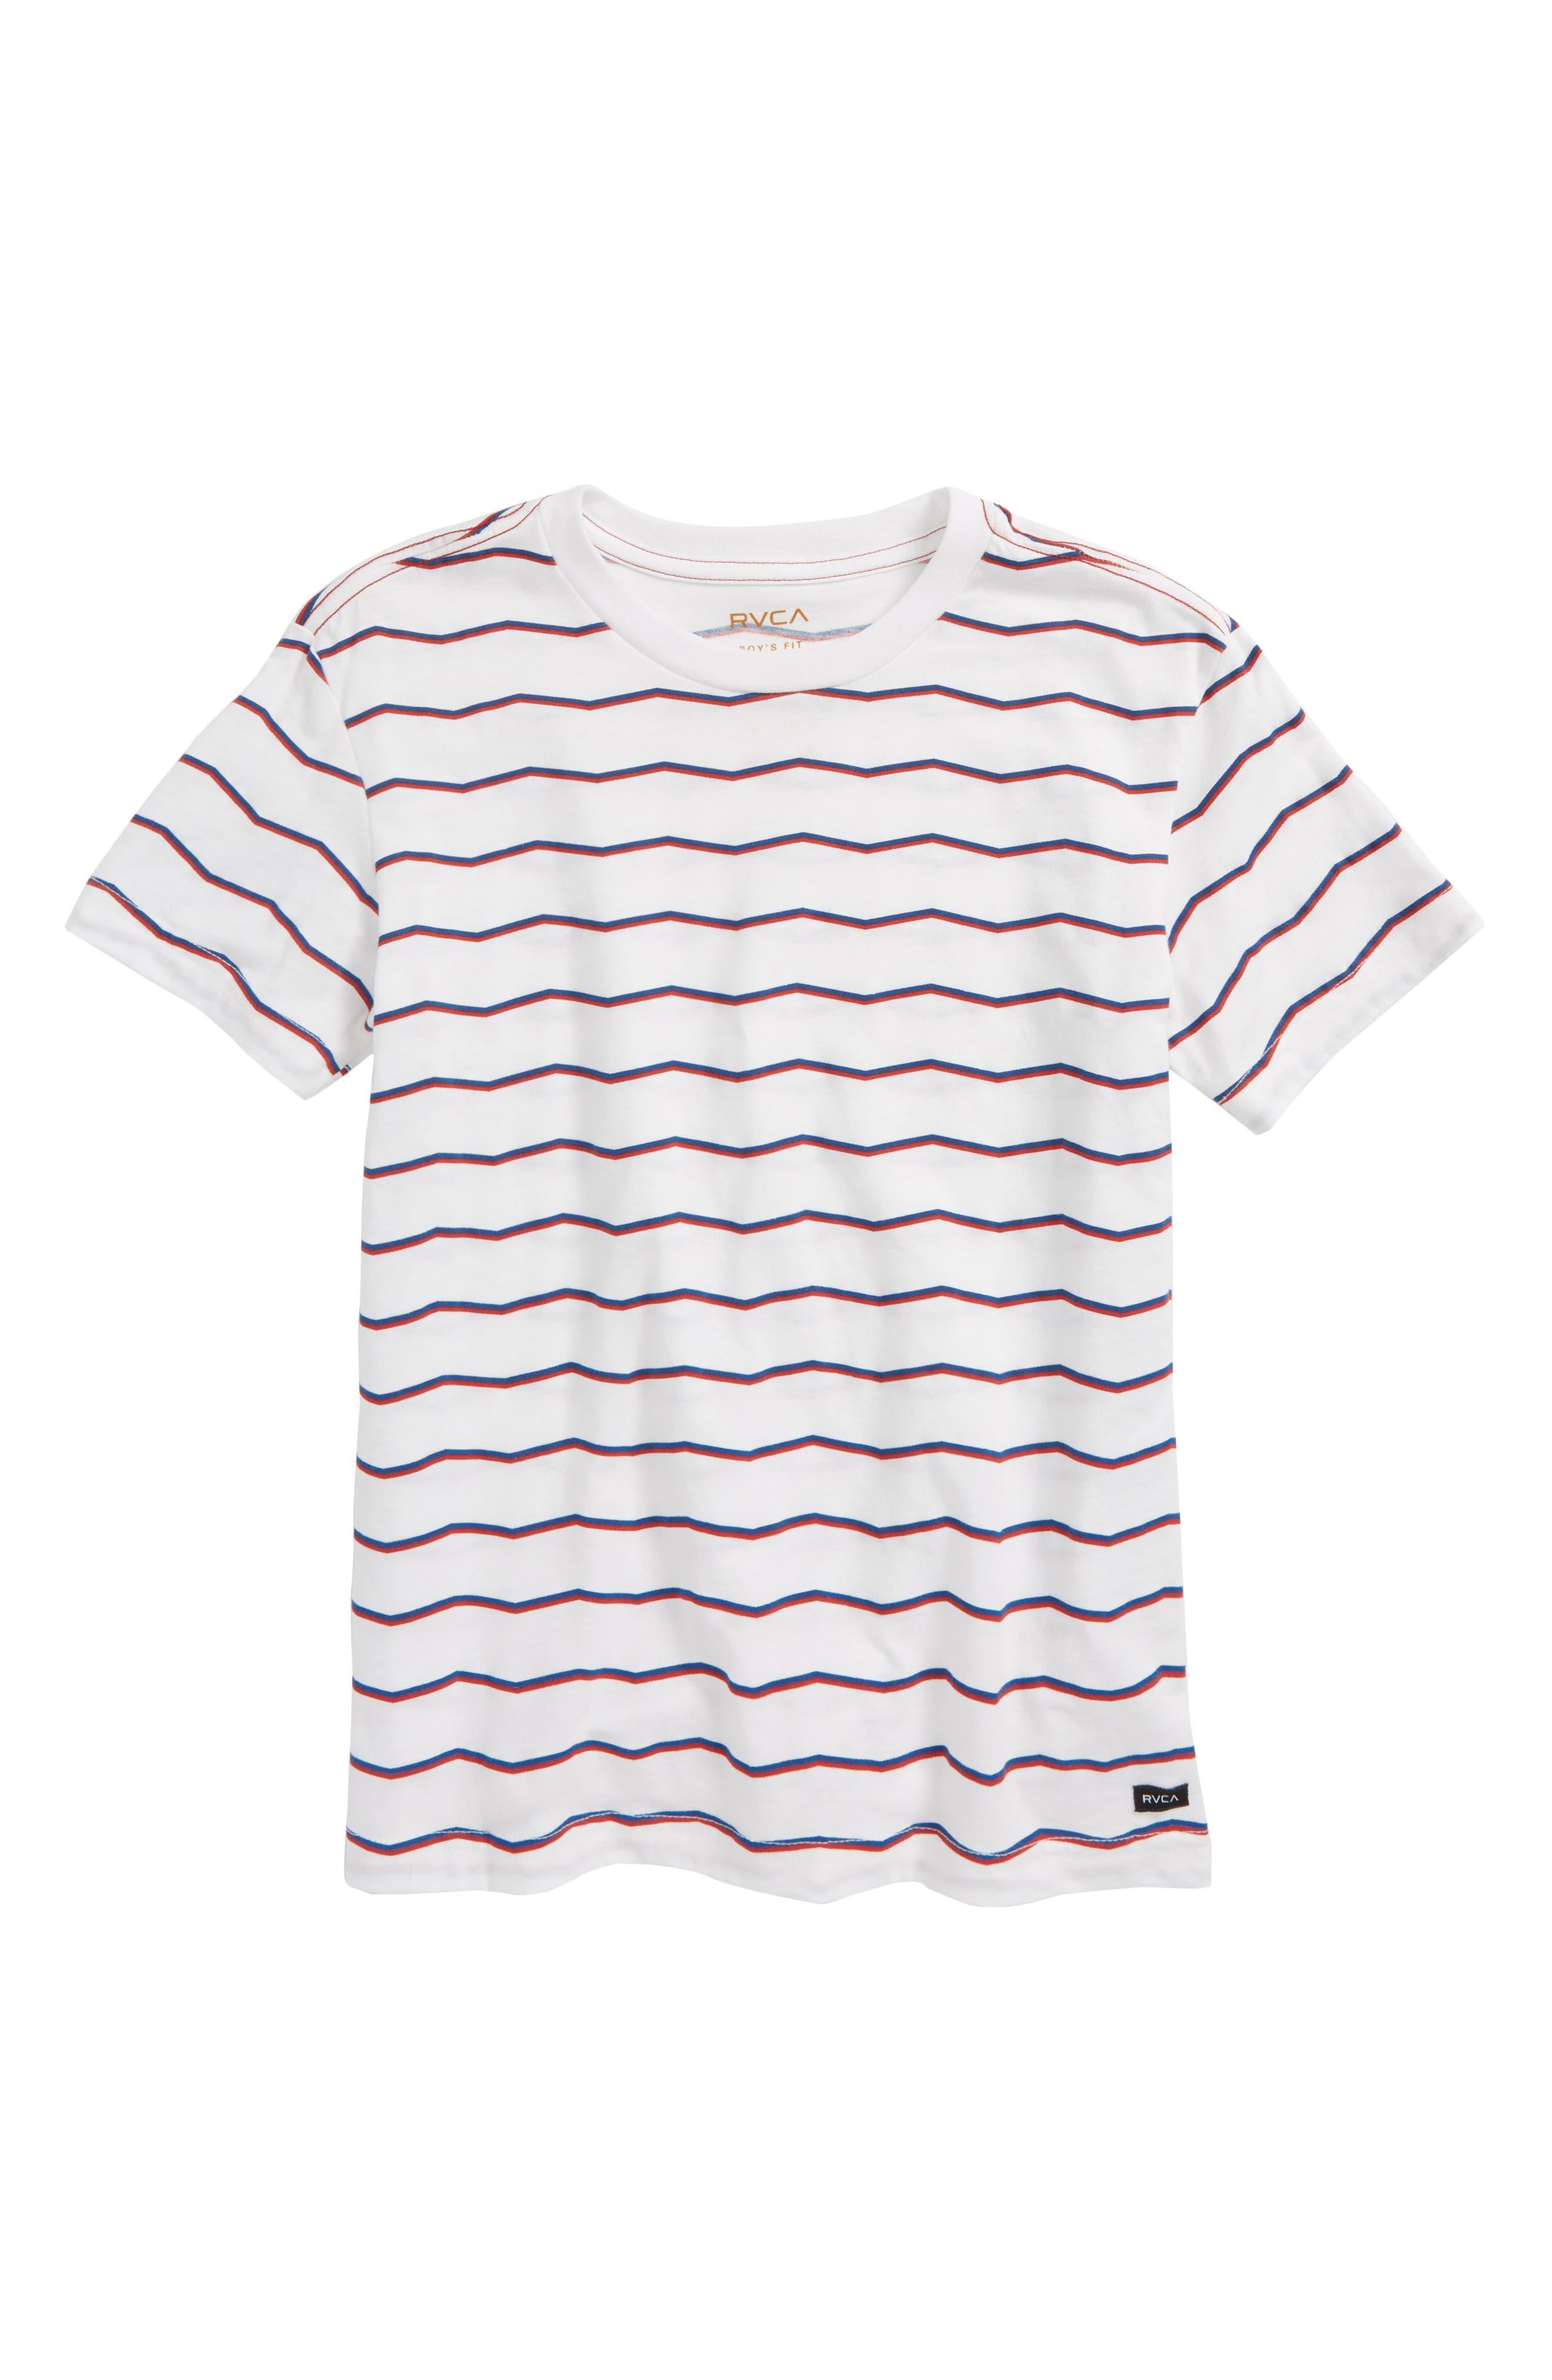 Stripe Shirt,                             Main thumbnail 1, color,                             Antique White